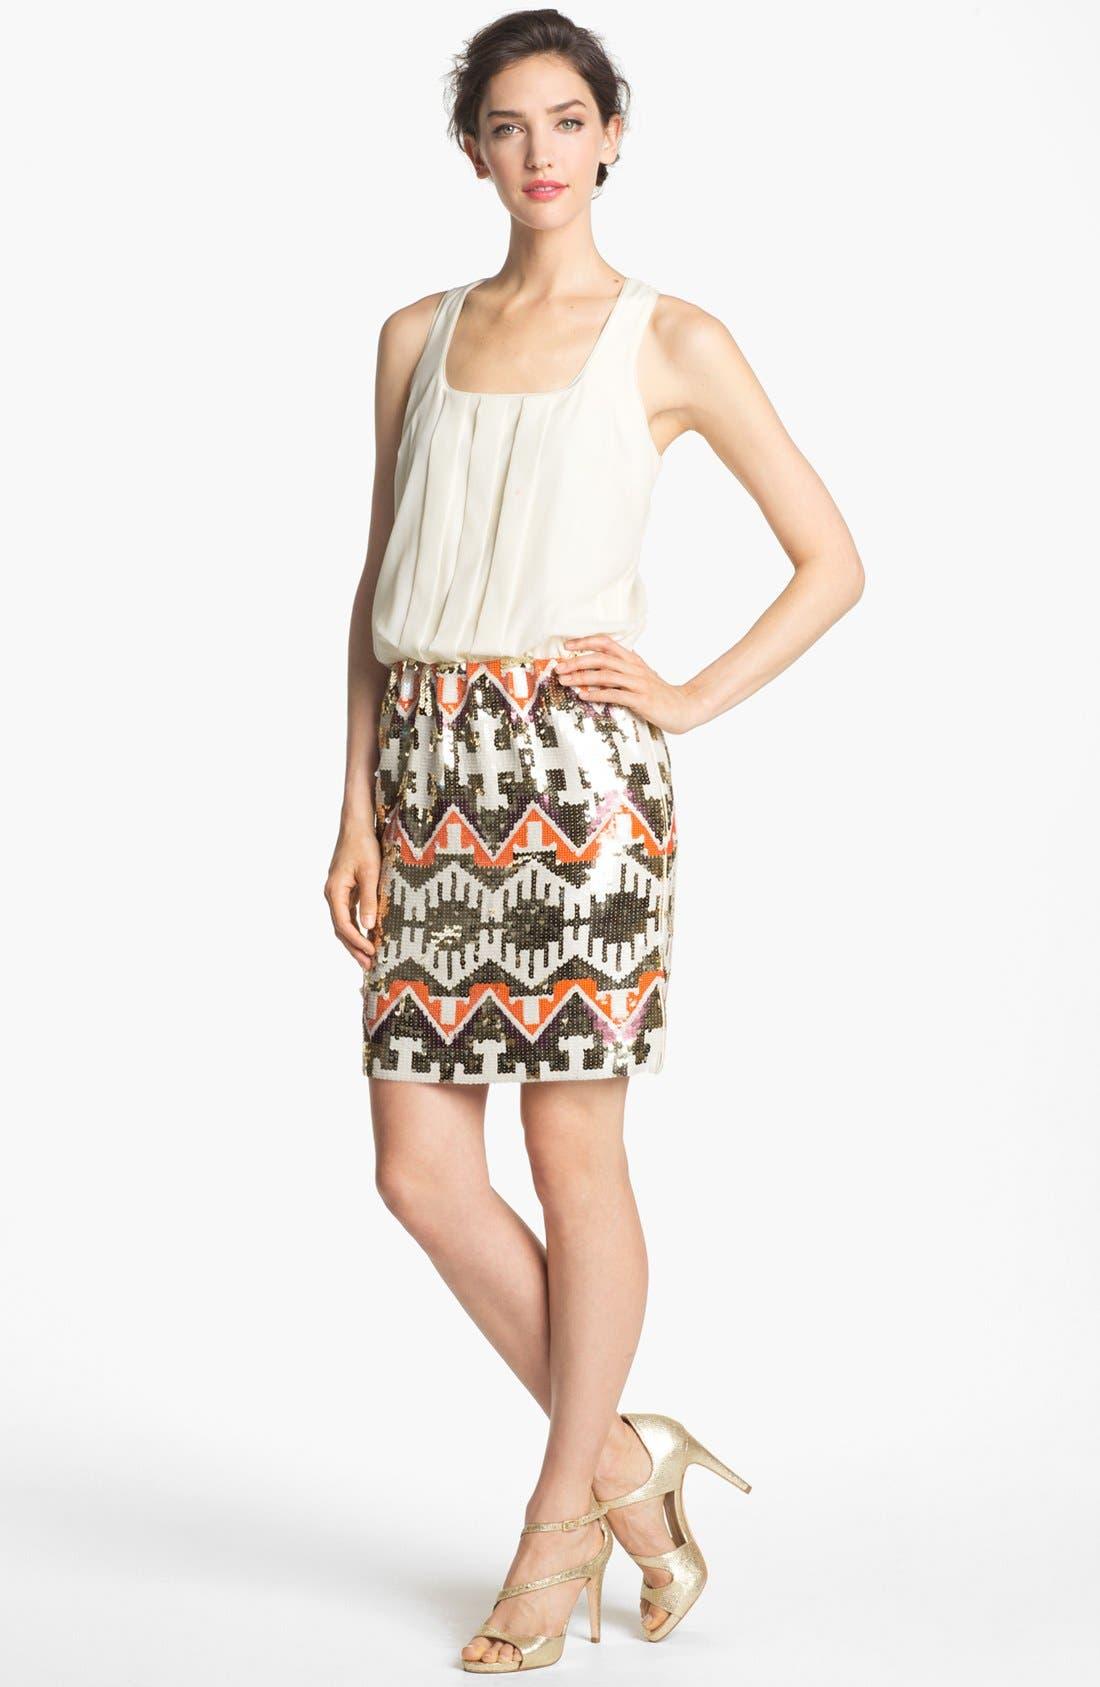 Alternate Image 1 Selected - Jessica Simpson Racerback Blouson Sequin Skirt Dress